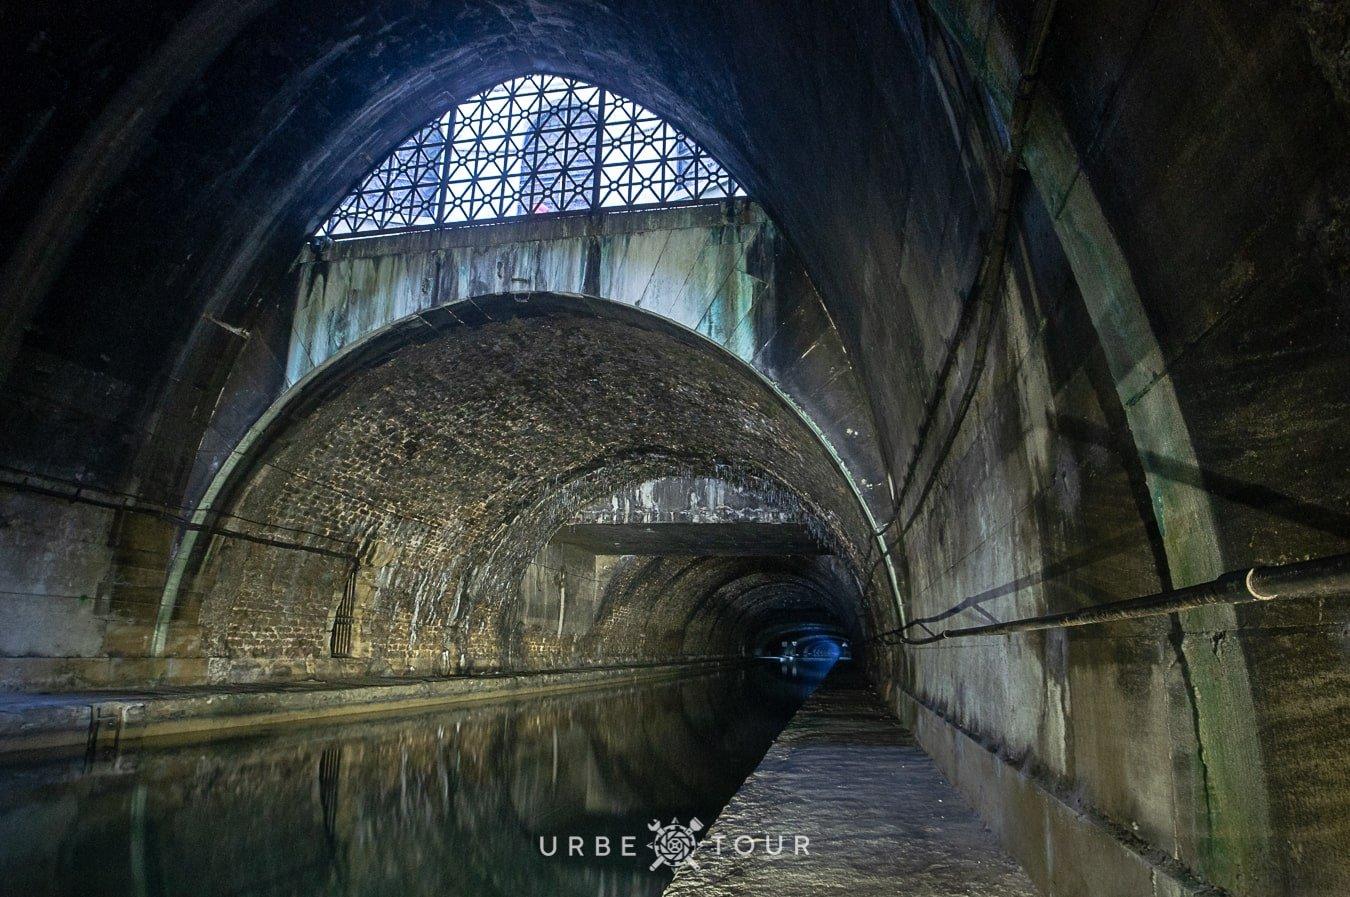 Saint Martin Canal Is The Biggest Underground River In Paris